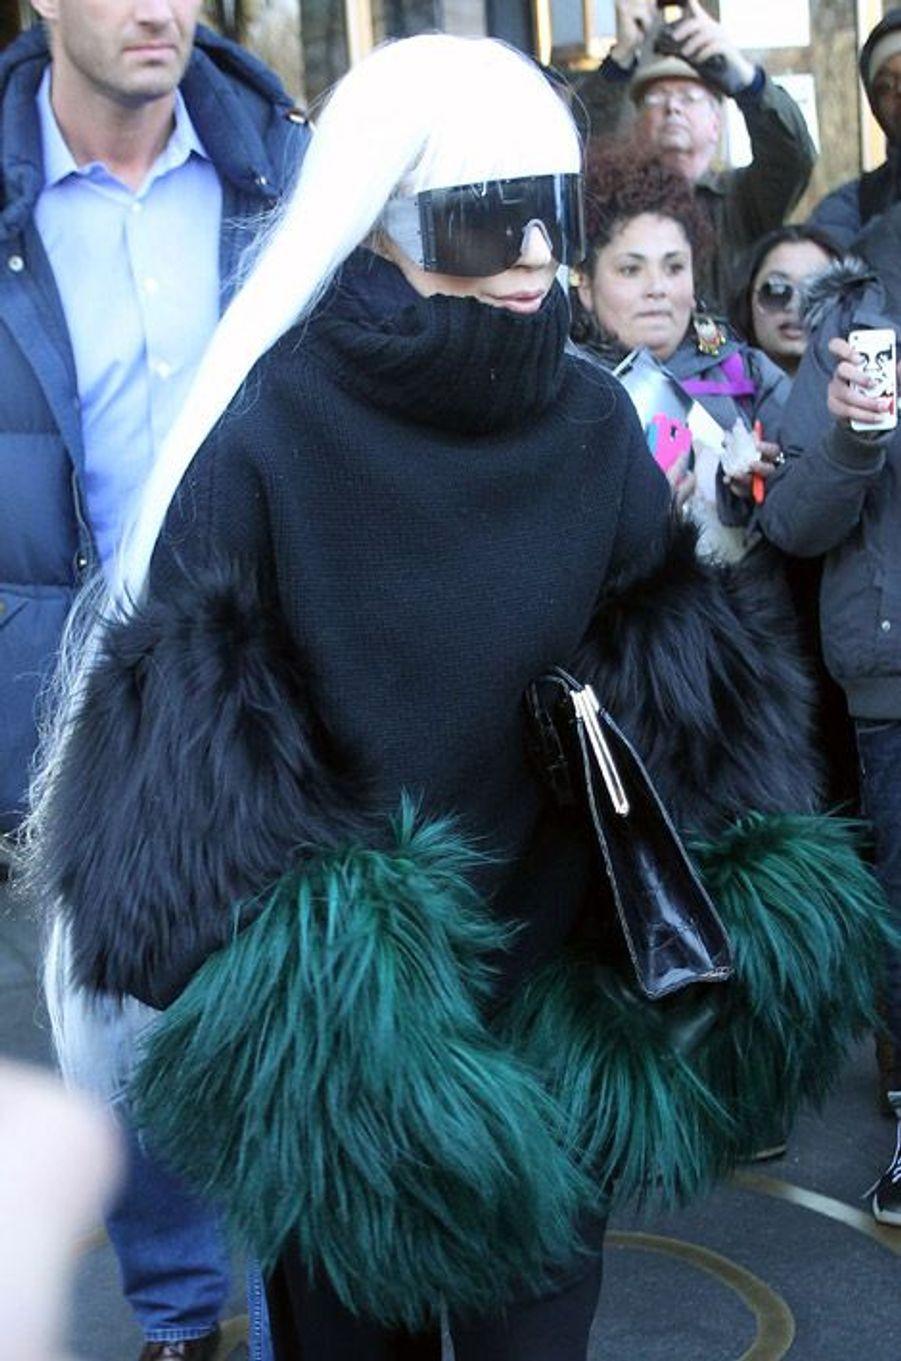 La chanteuse Lady Gaga à New York, le 26 mars 2014